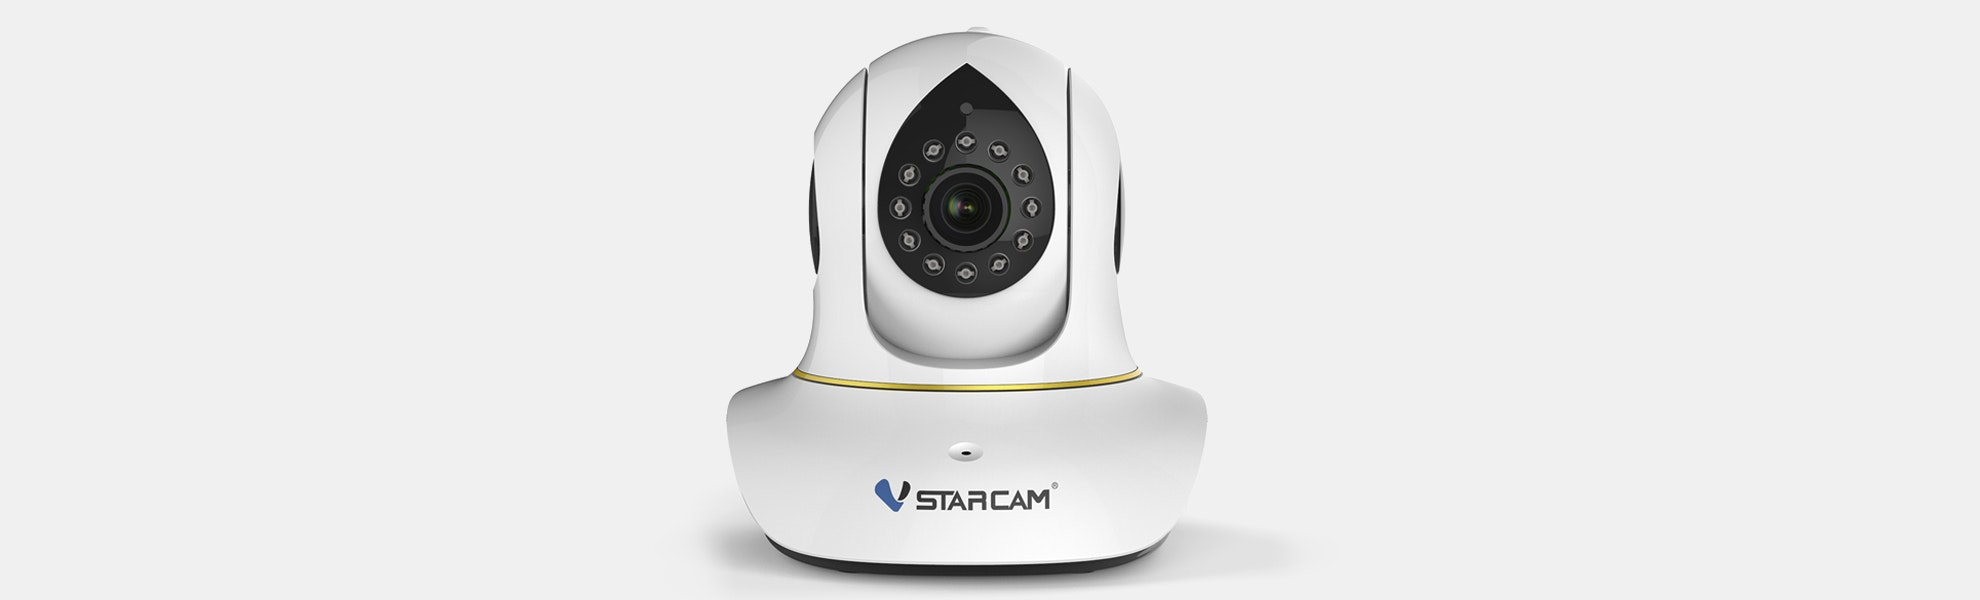 VStarcam C38S 1080p IP Camera